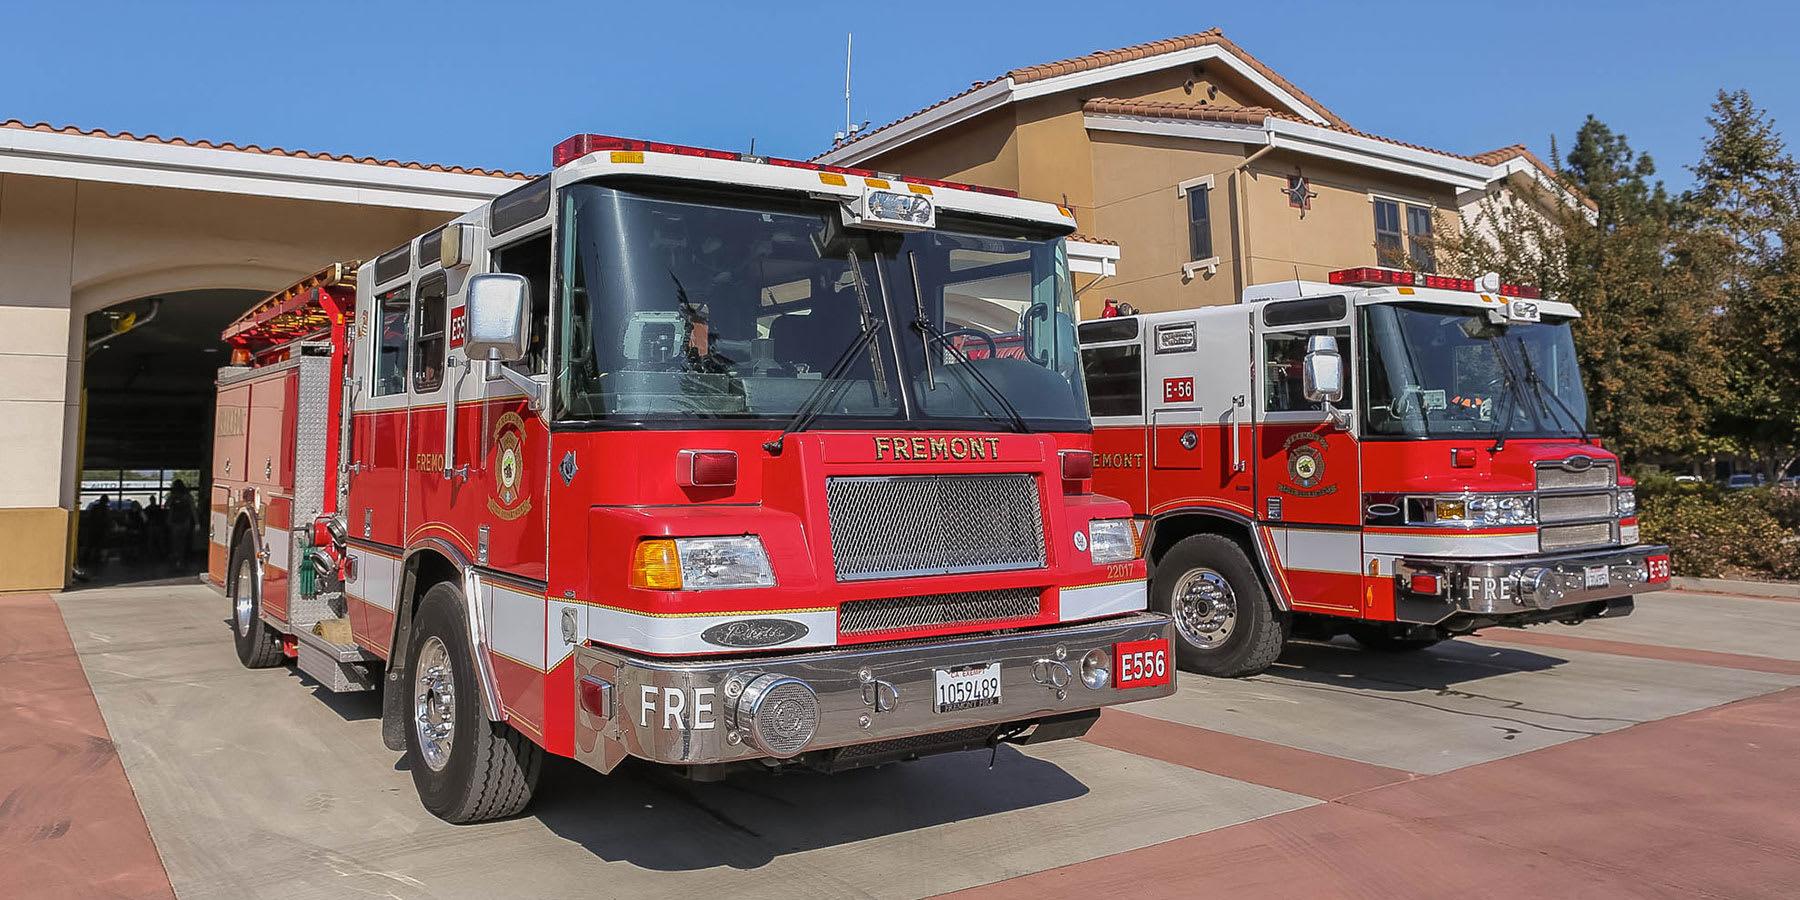 Firetrucks are a firestation in Fremont, California